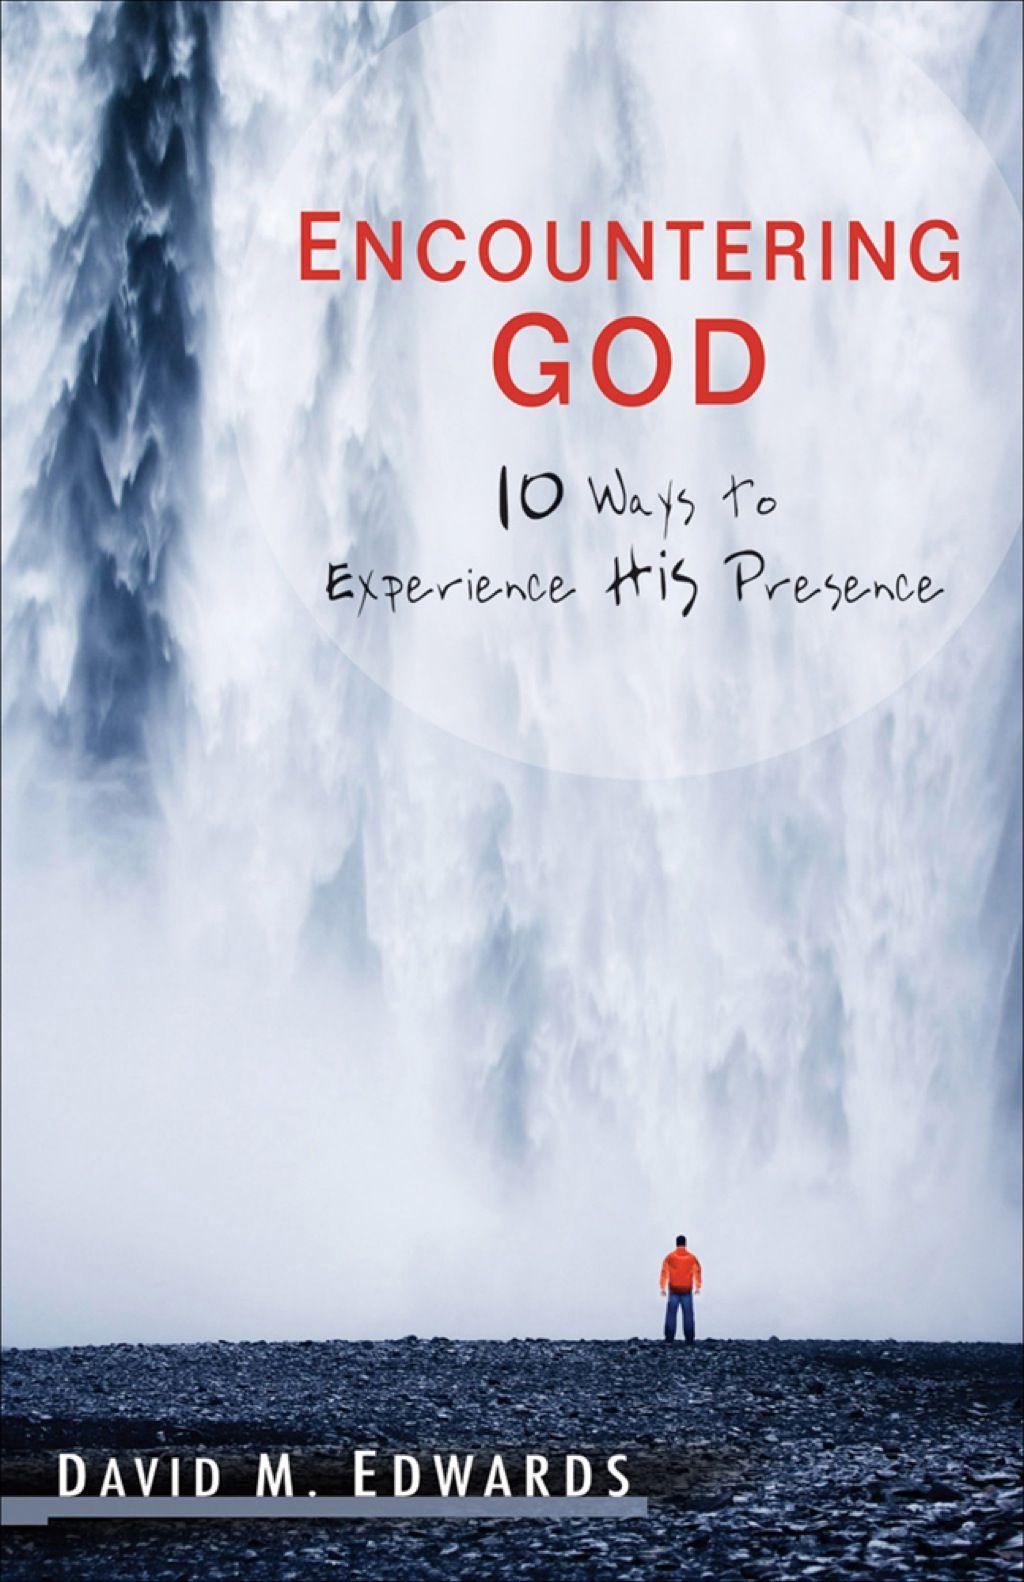 Encountering god ebook ebooks prayer book god